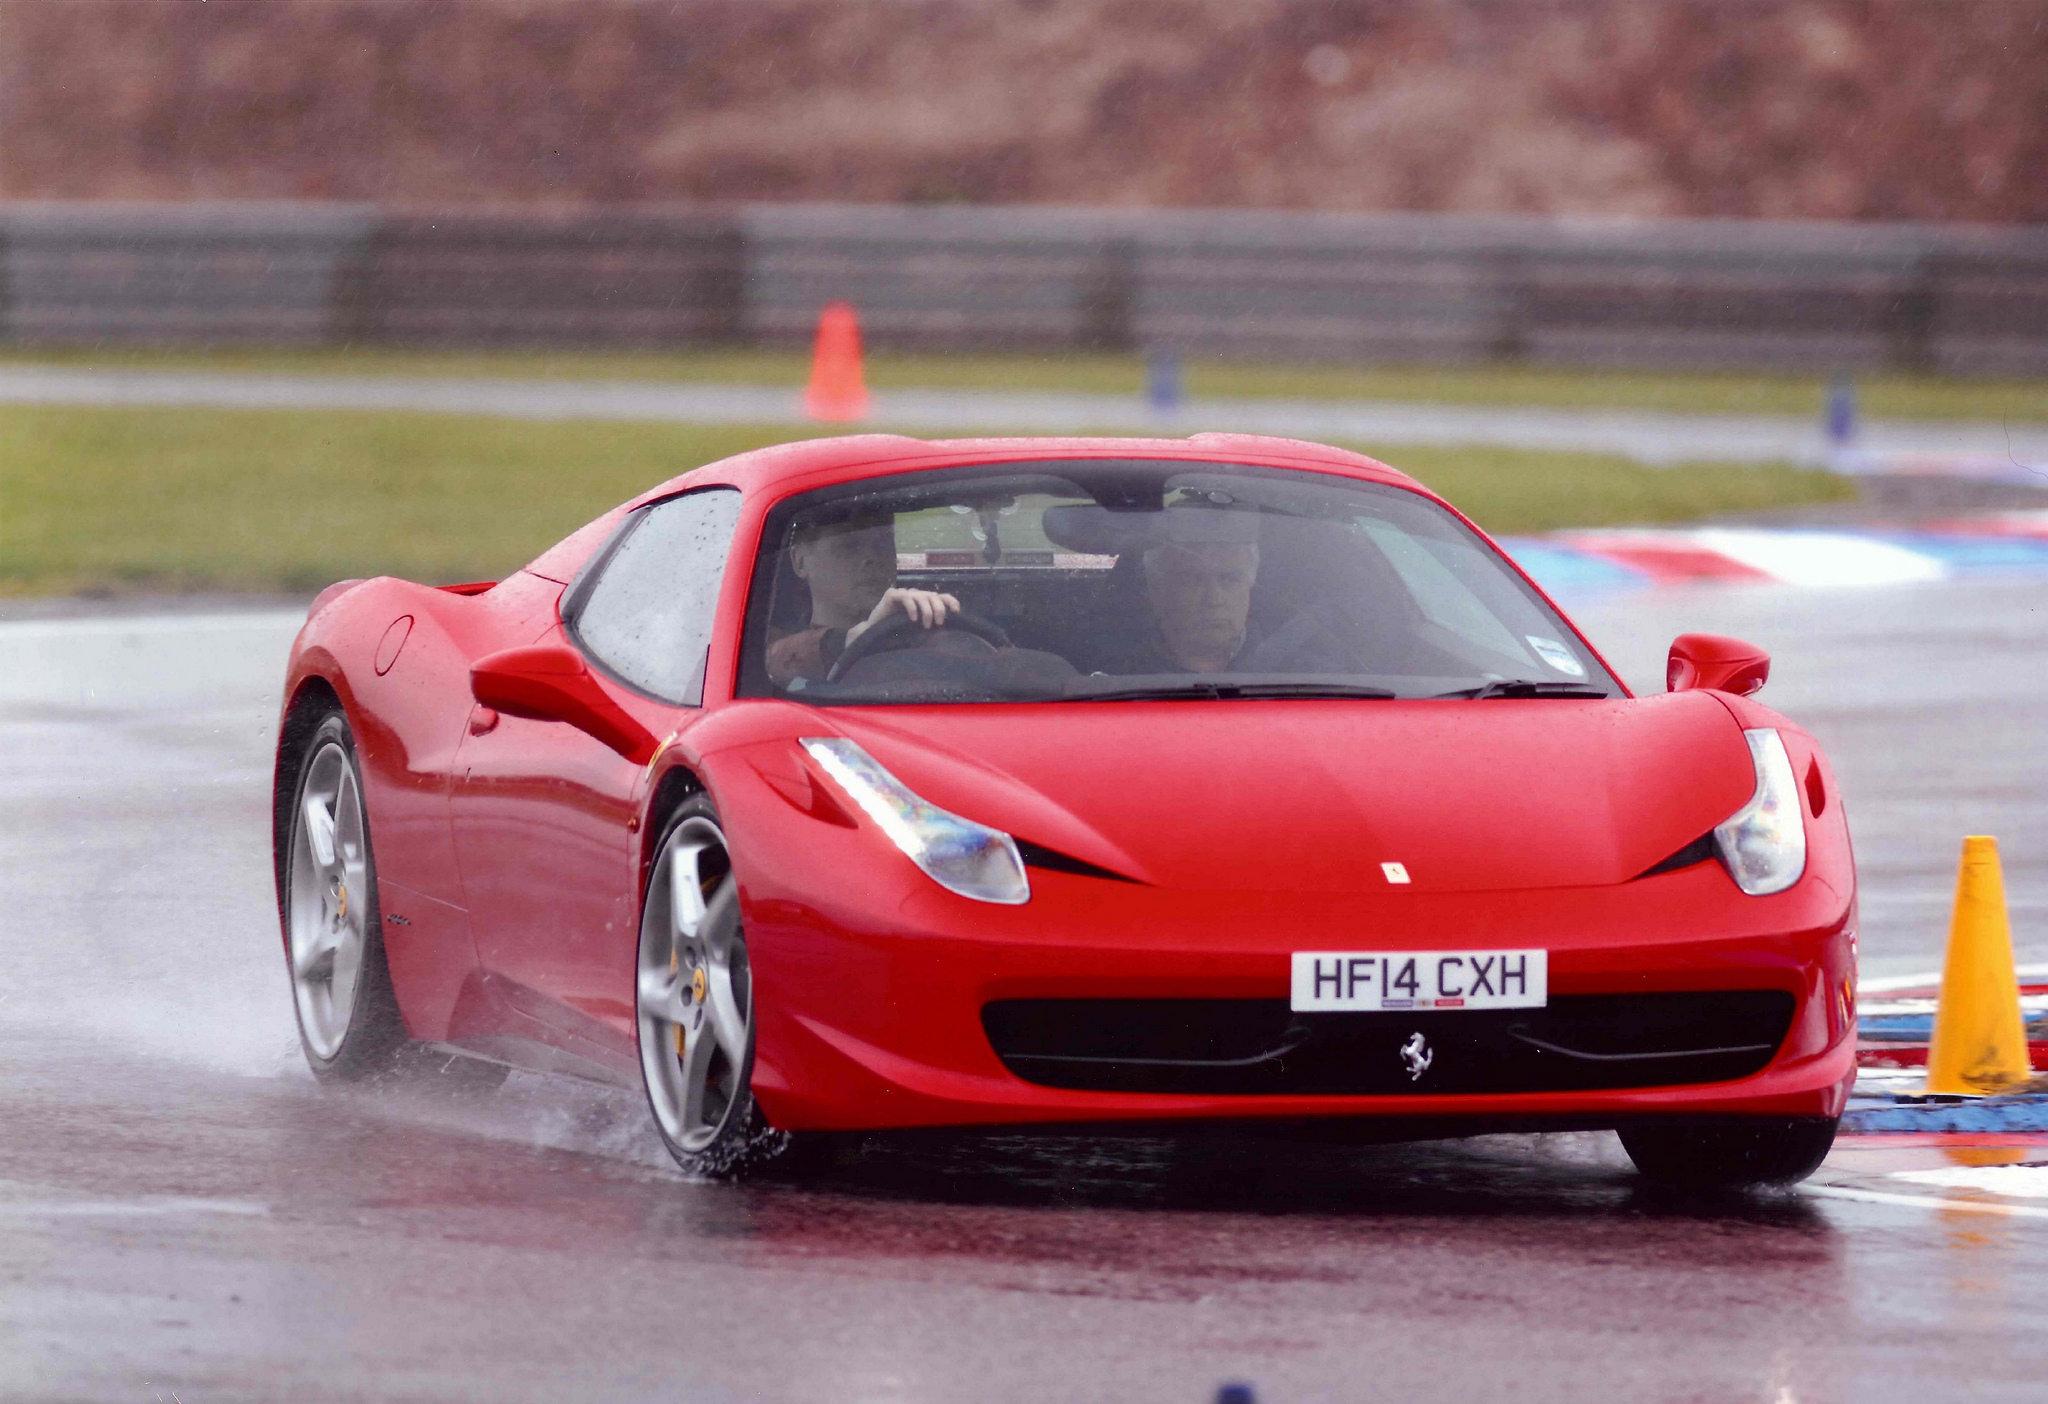 Car Porn Top Gear 2010 Ferrari 458 Italia Review Gillyberlin